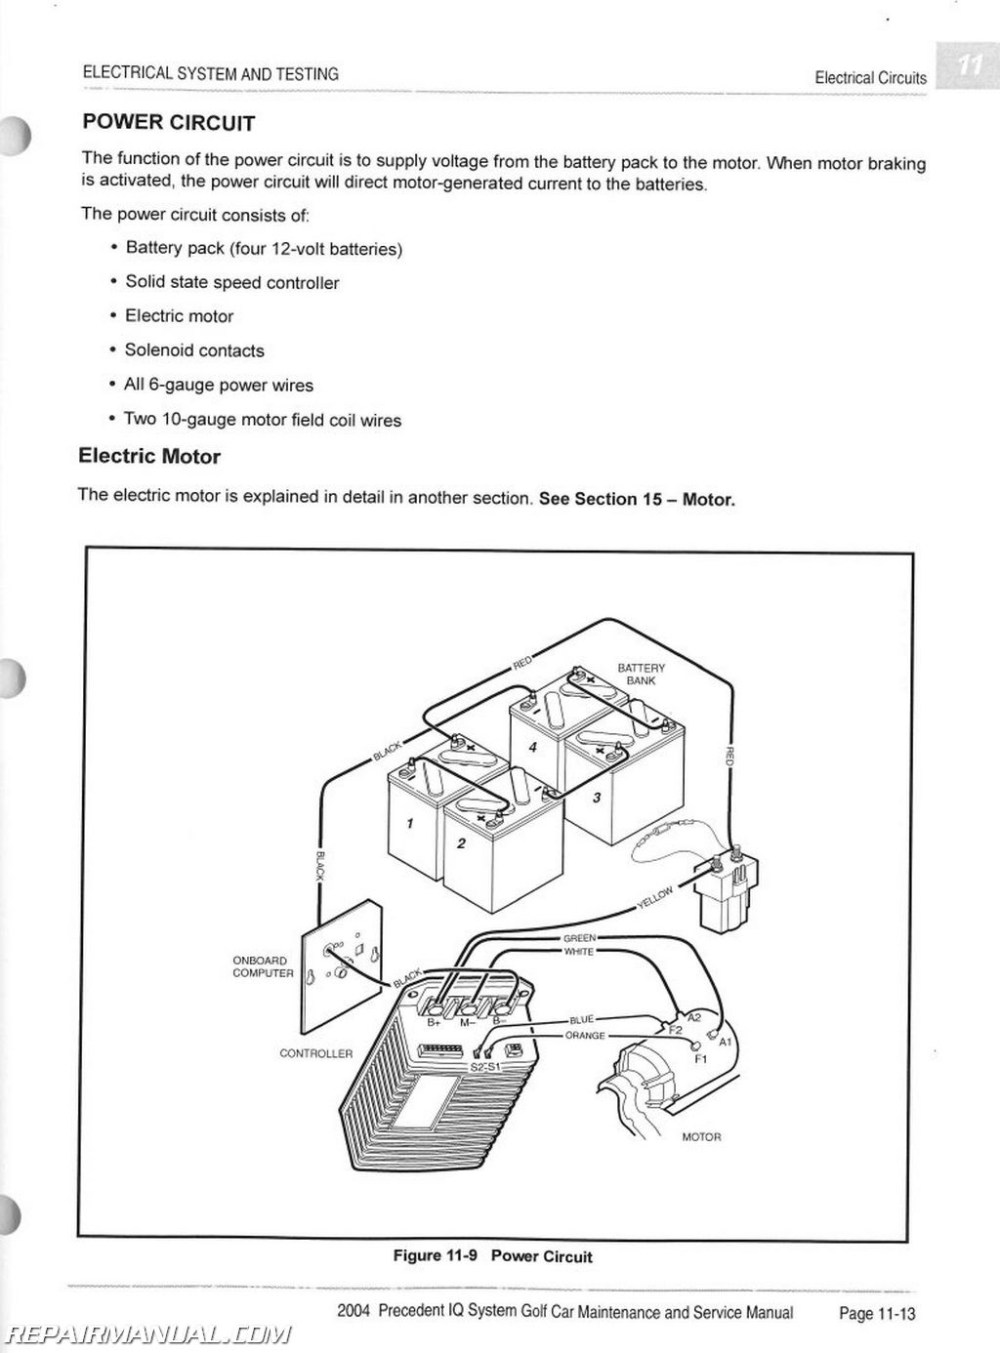 medium resolution of 2008 club car precedent wiring diagram images